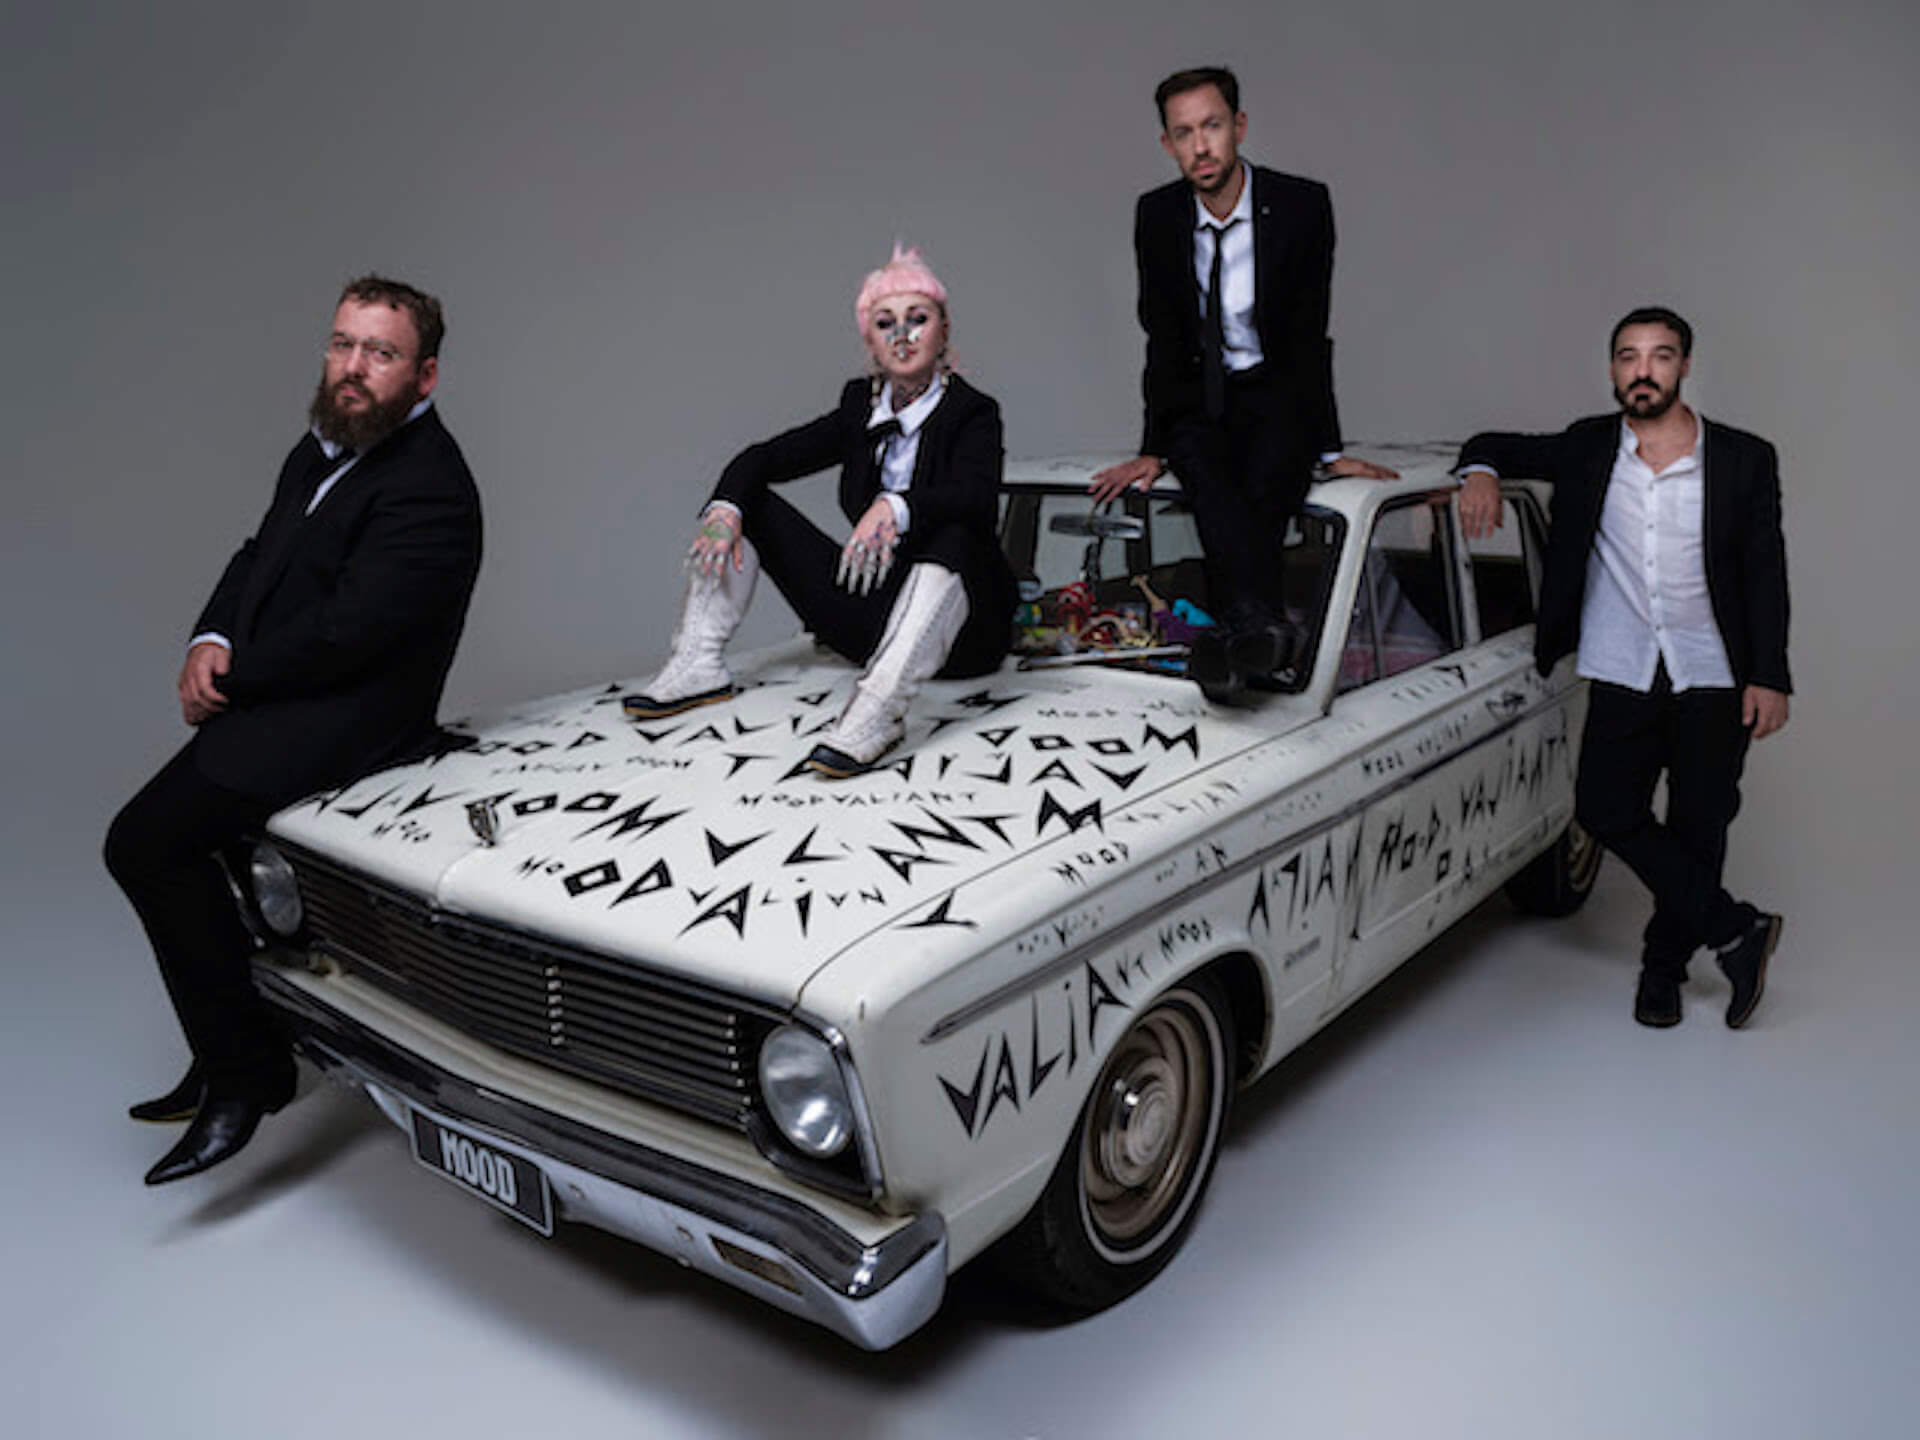 "Hiatus Kaiyoteが6月発売の新アルバム『Mood Valiant』収録曲""Red Room""をMVと共にリリース! music210427_hiatus-kaiyote-210427_1"